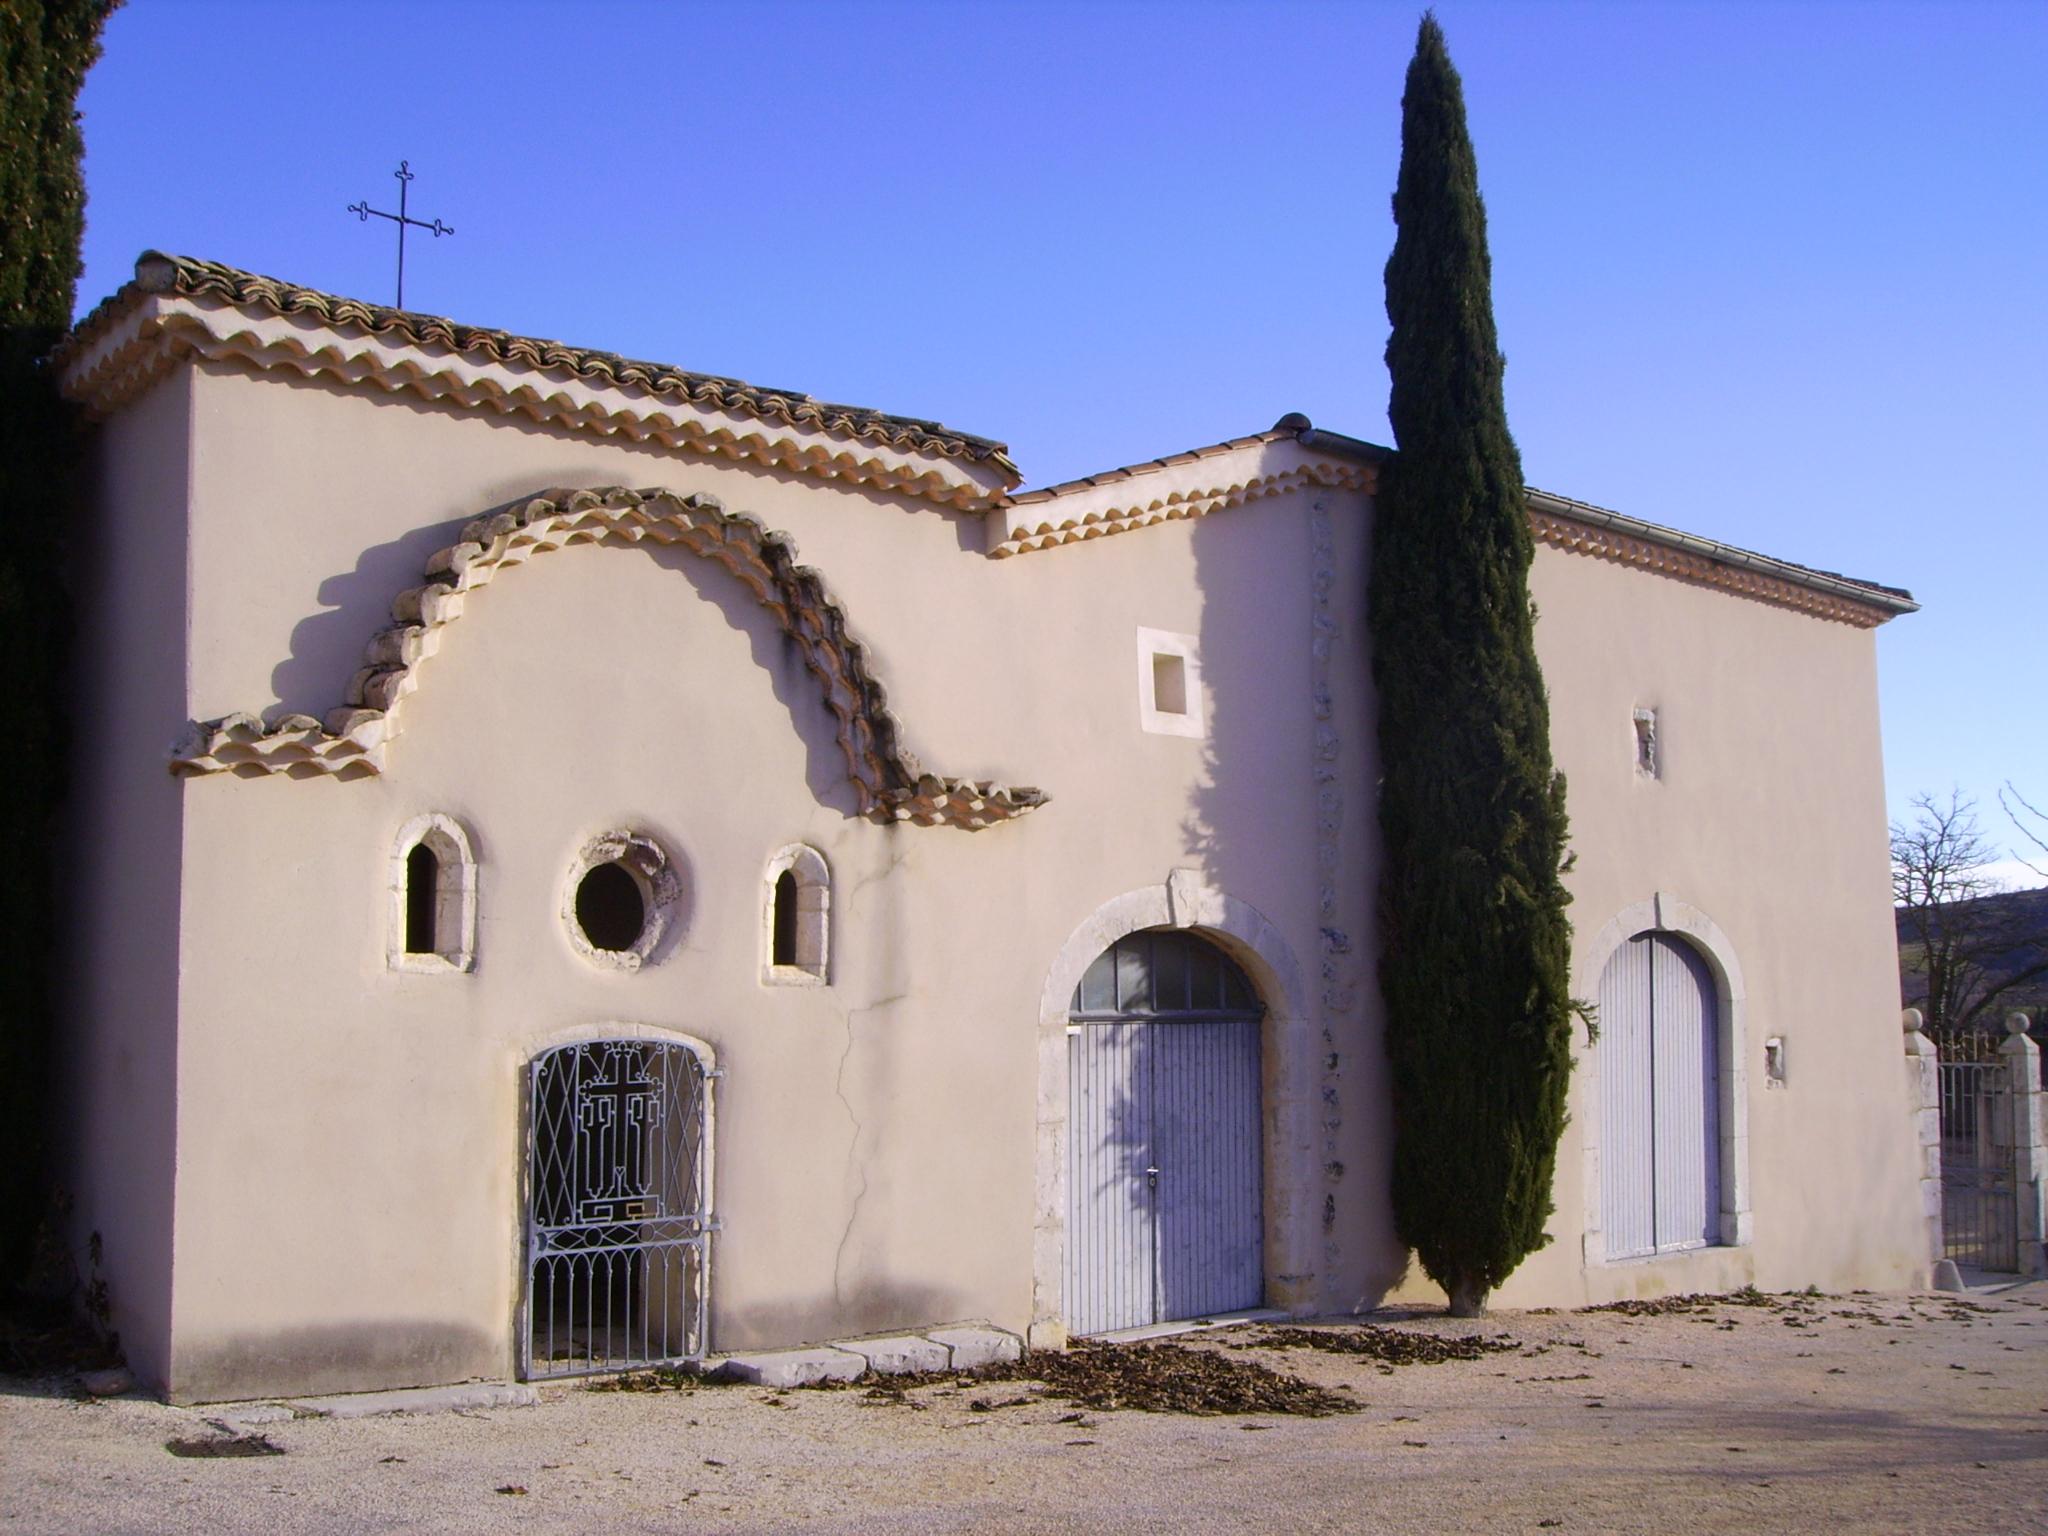 Domaine Olivier de Serres – Le Pradel, Mirabel